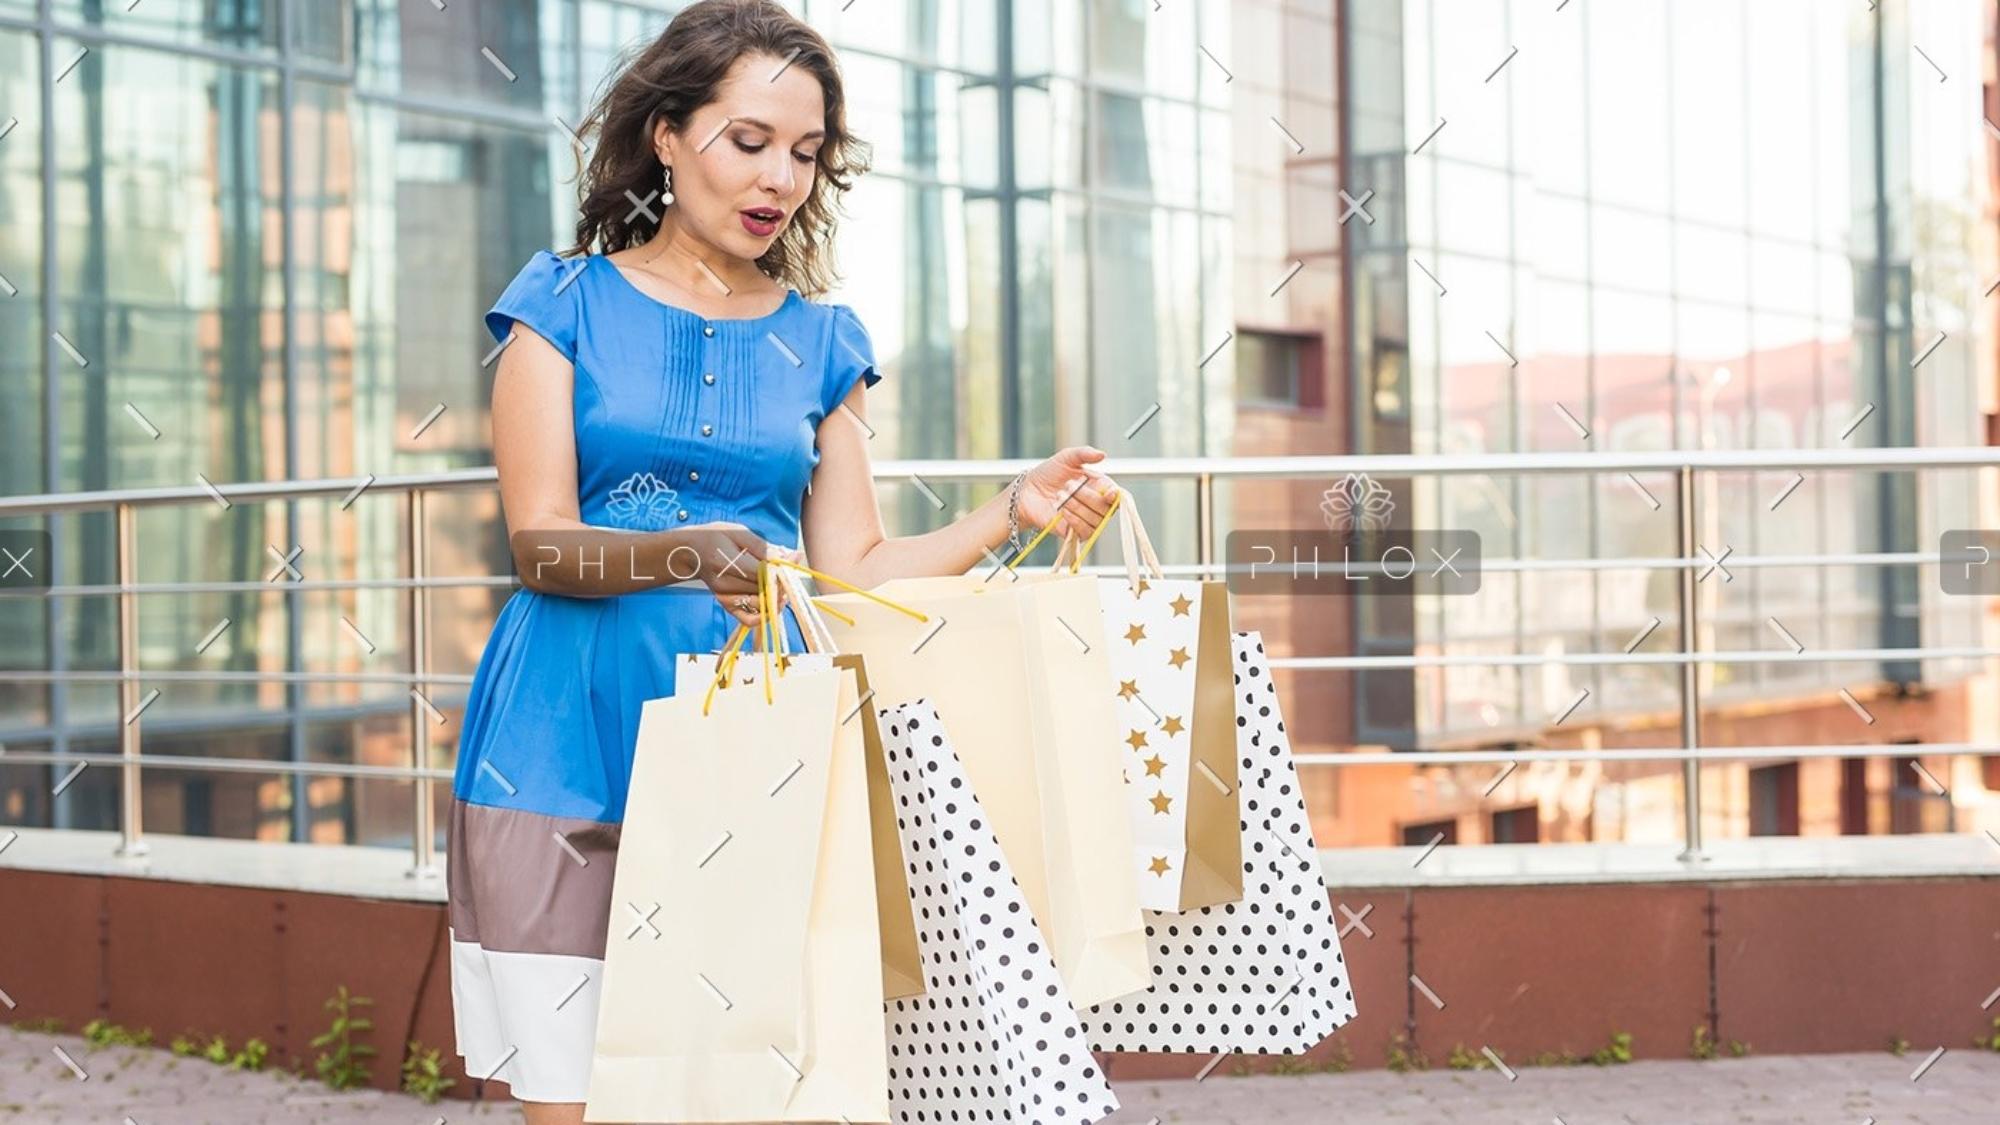 demo-attachment-154-shopper-shopaholic-shopping-woman-holding-many-PCWUSW9